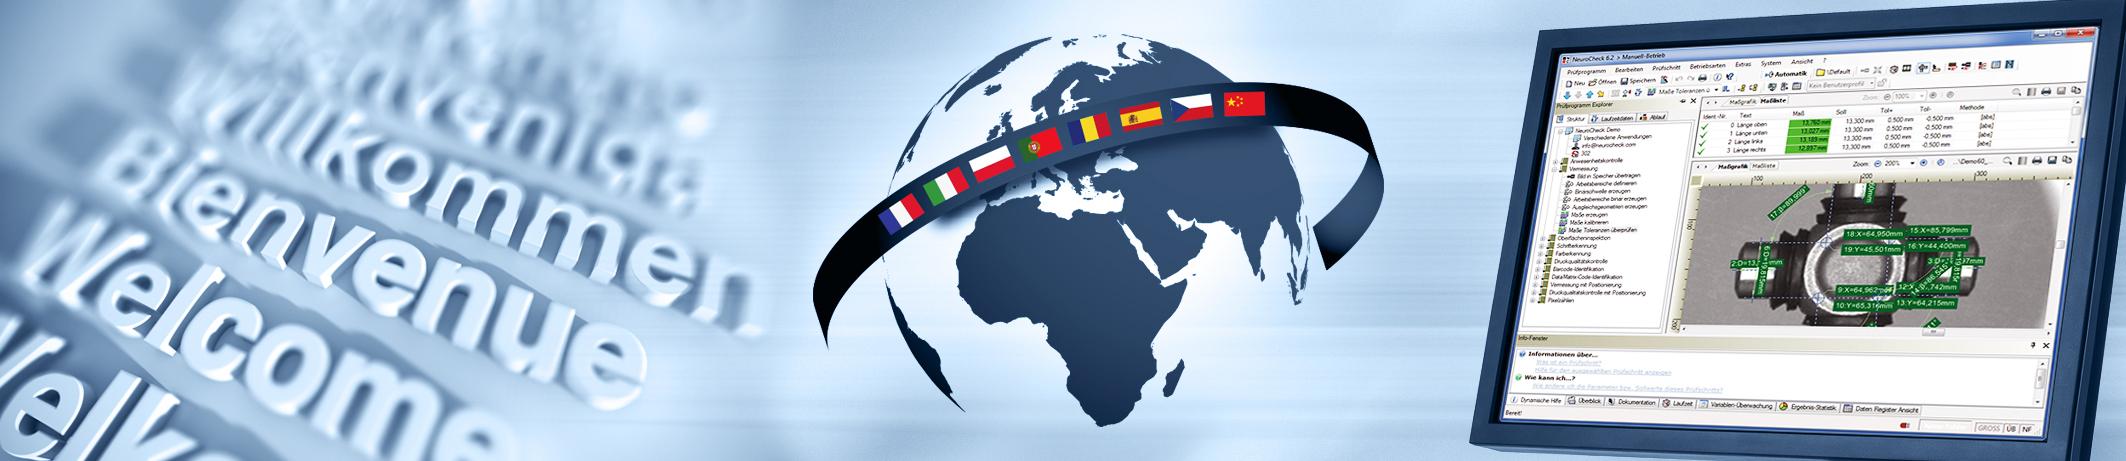 NeuroCheck Software Multilingual (Image © NeuroCheck)